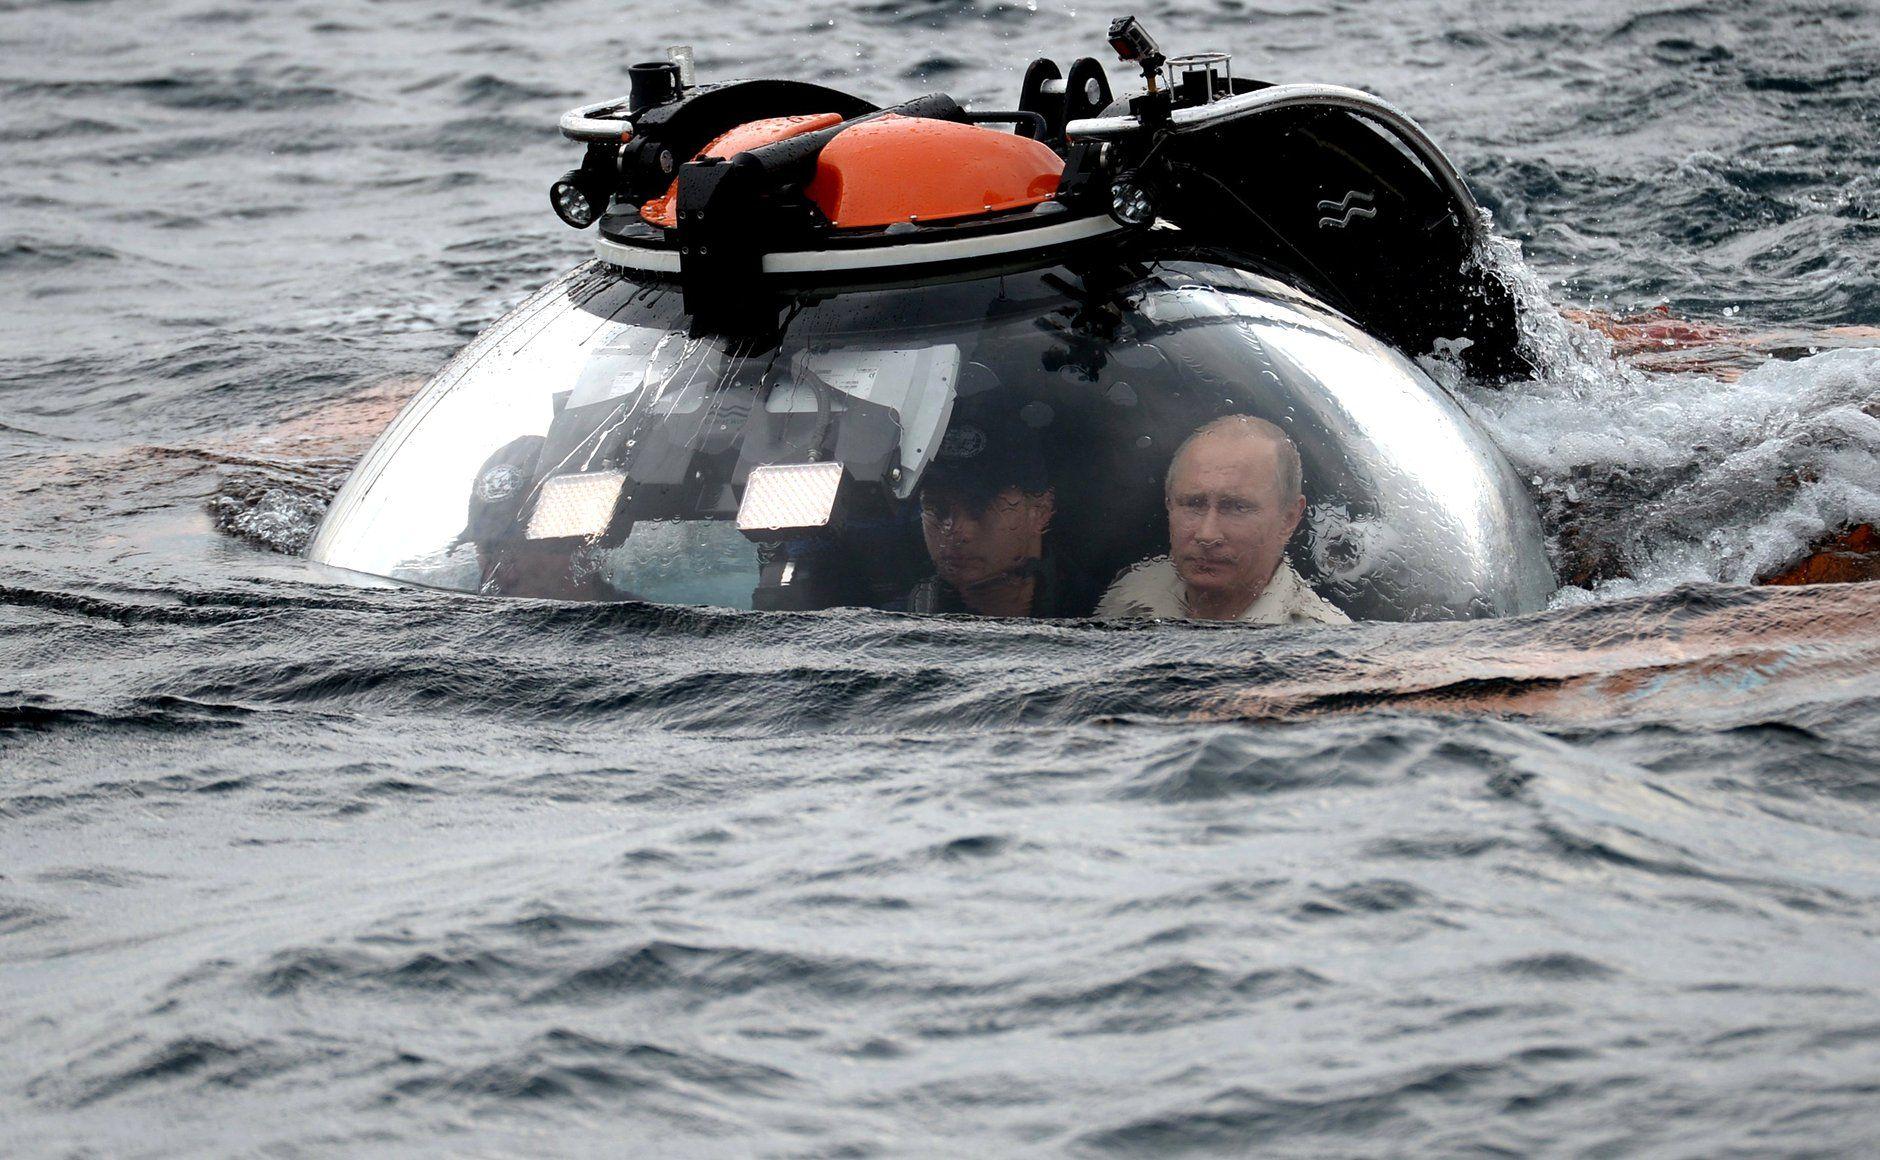 Nuclear War: Vladimir Putin Updating Doomsday Plane In Terrifying Pace! - http://www.morningnewsusa.com/nuclear-war-vladimir-putin-updating-doomsday-plane-terrifying-pace-2394458.html